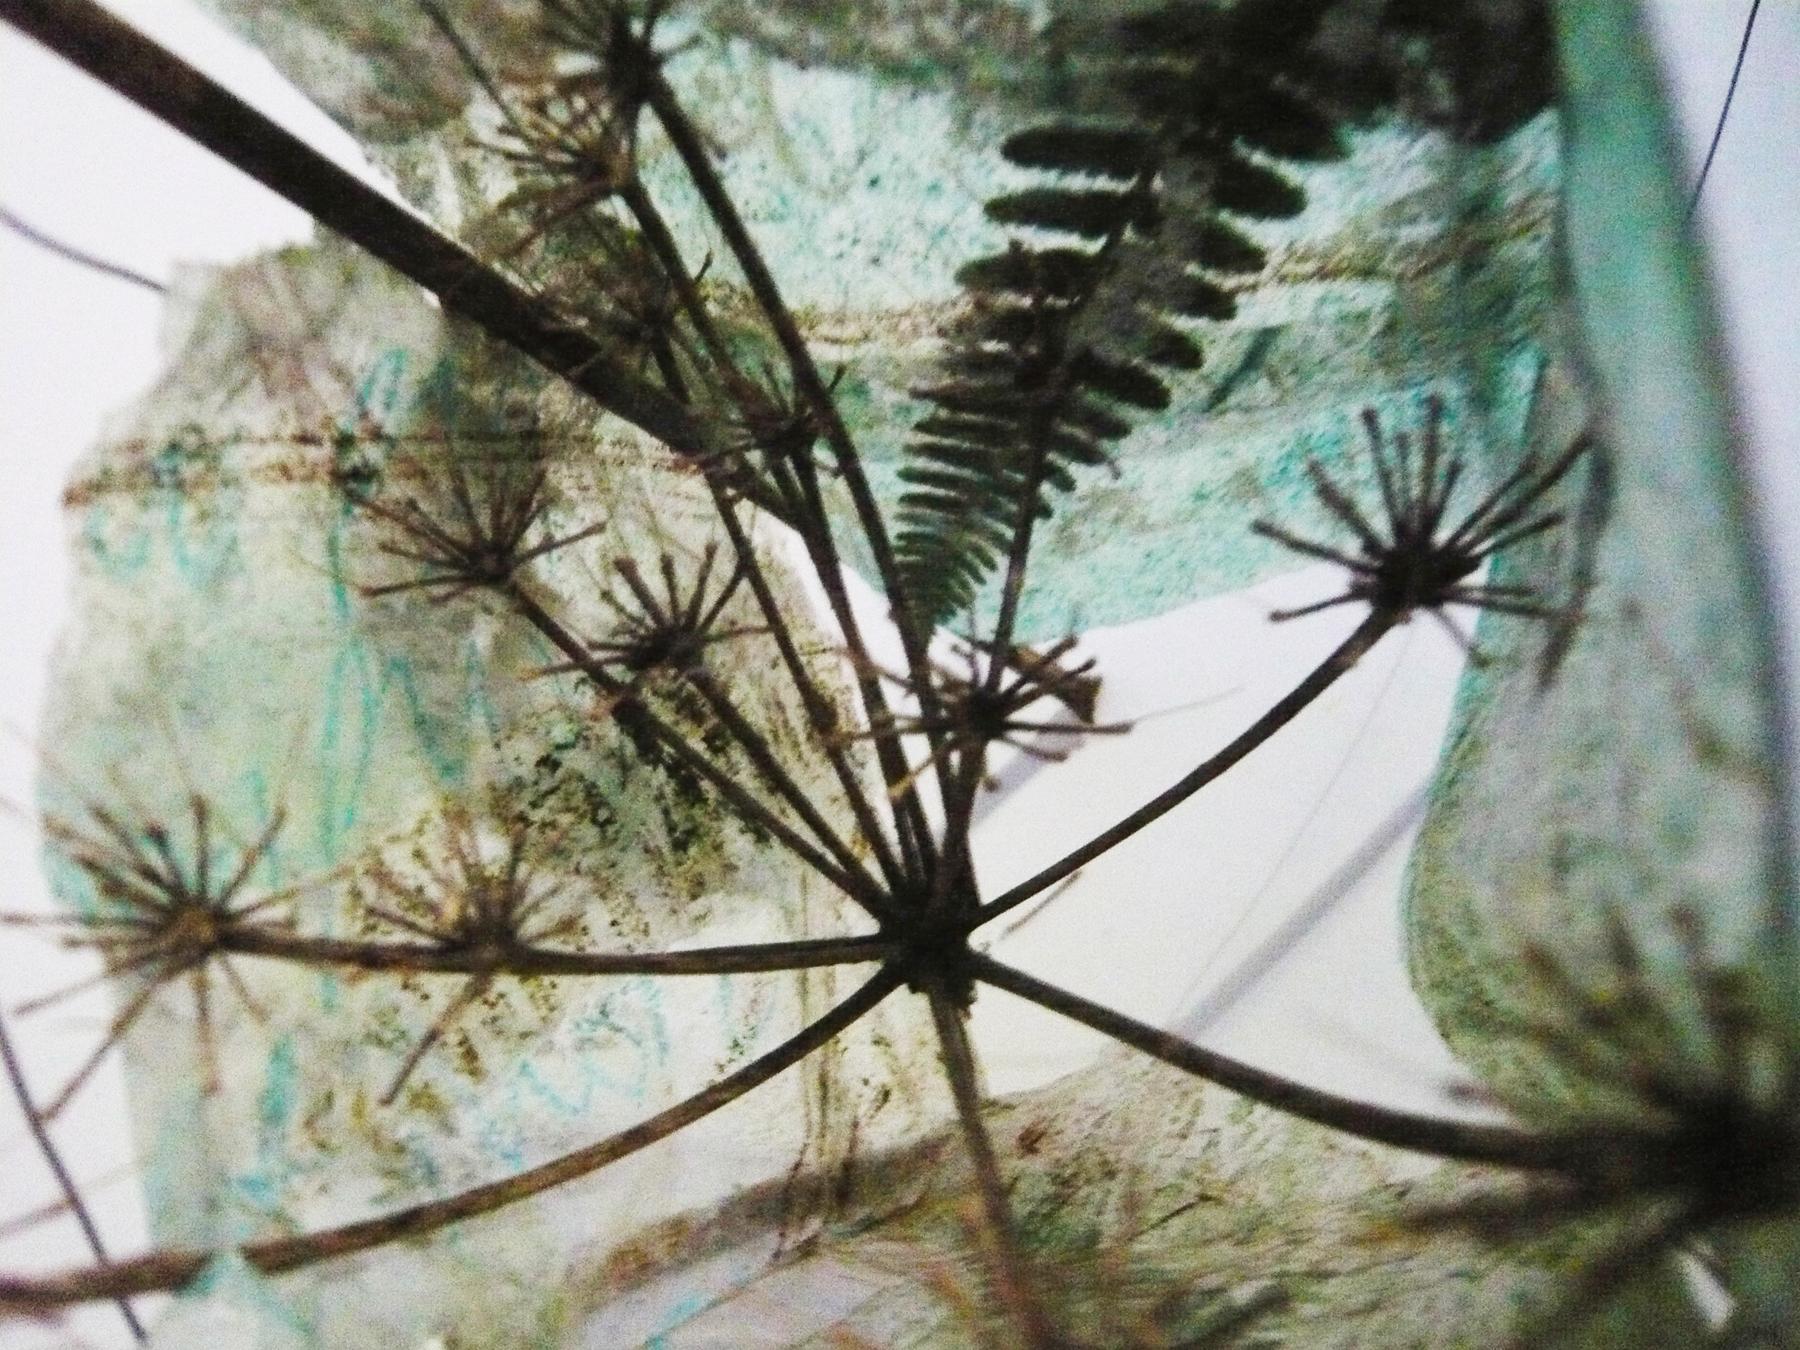 Poems & Plants - Weedling Wild - inside